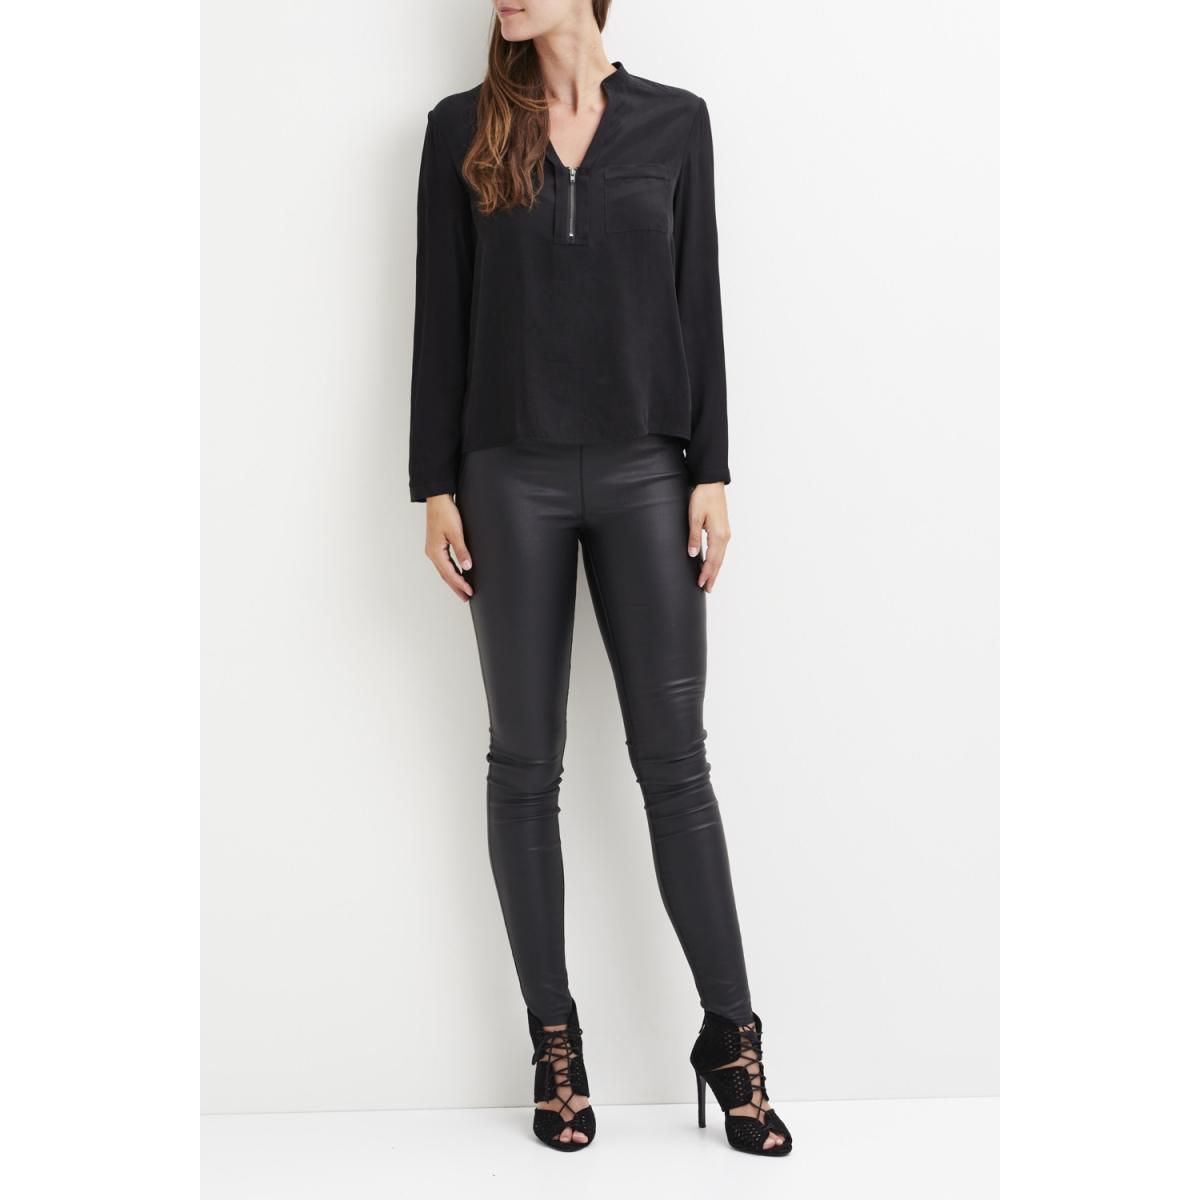 objstabi l/s top 93 23025441 object blouse black